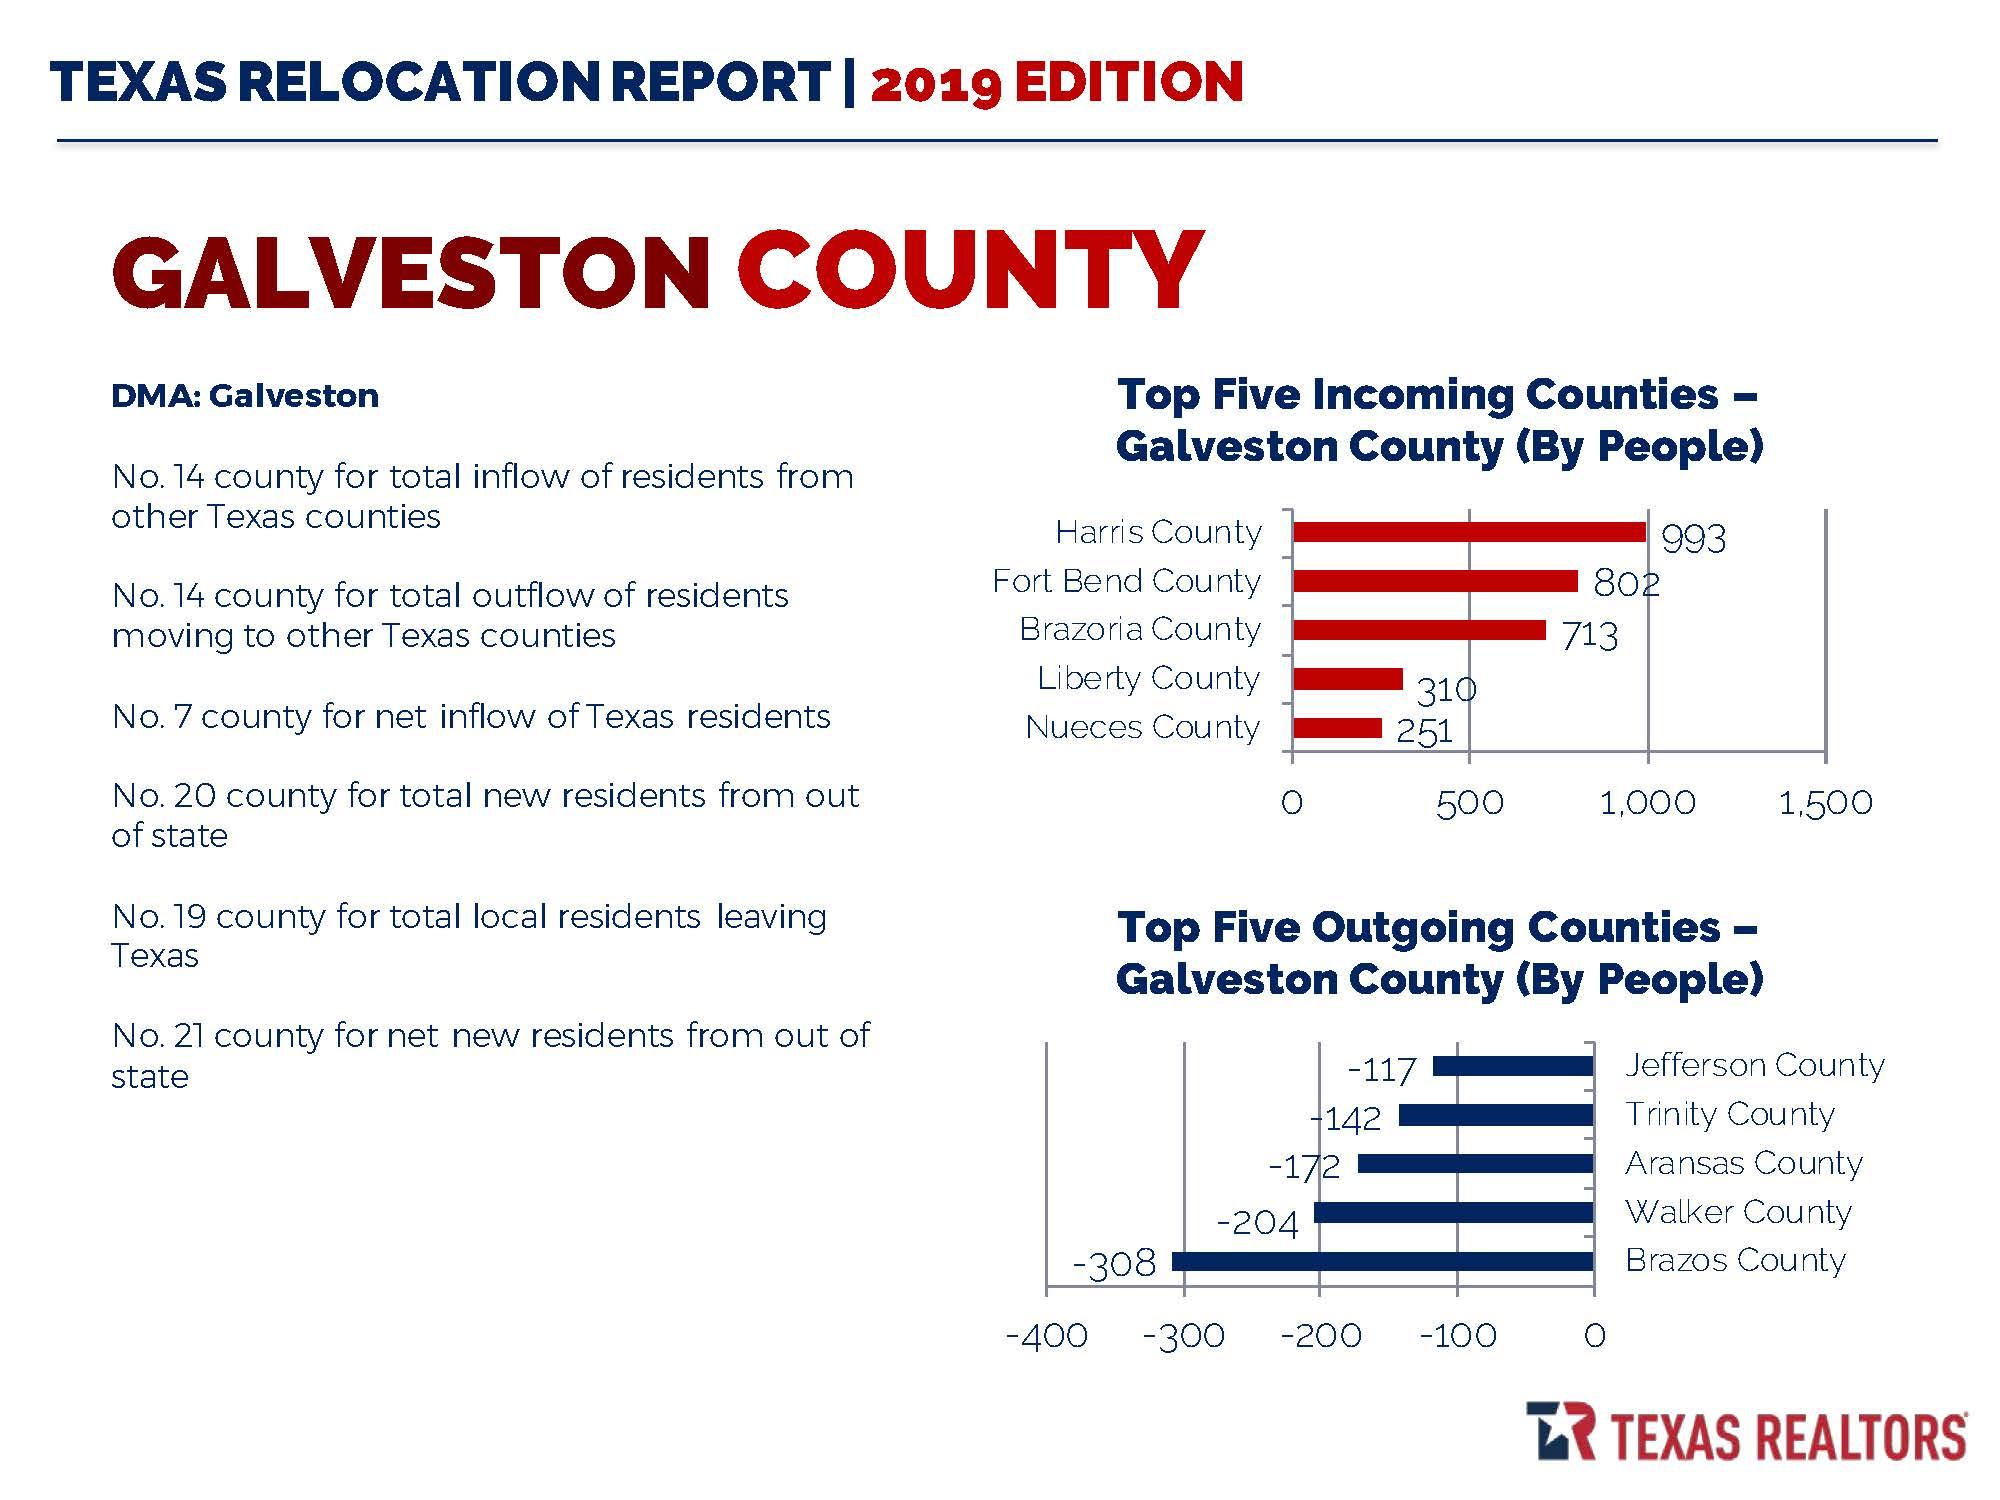 2019 Galveston County Relocation Report